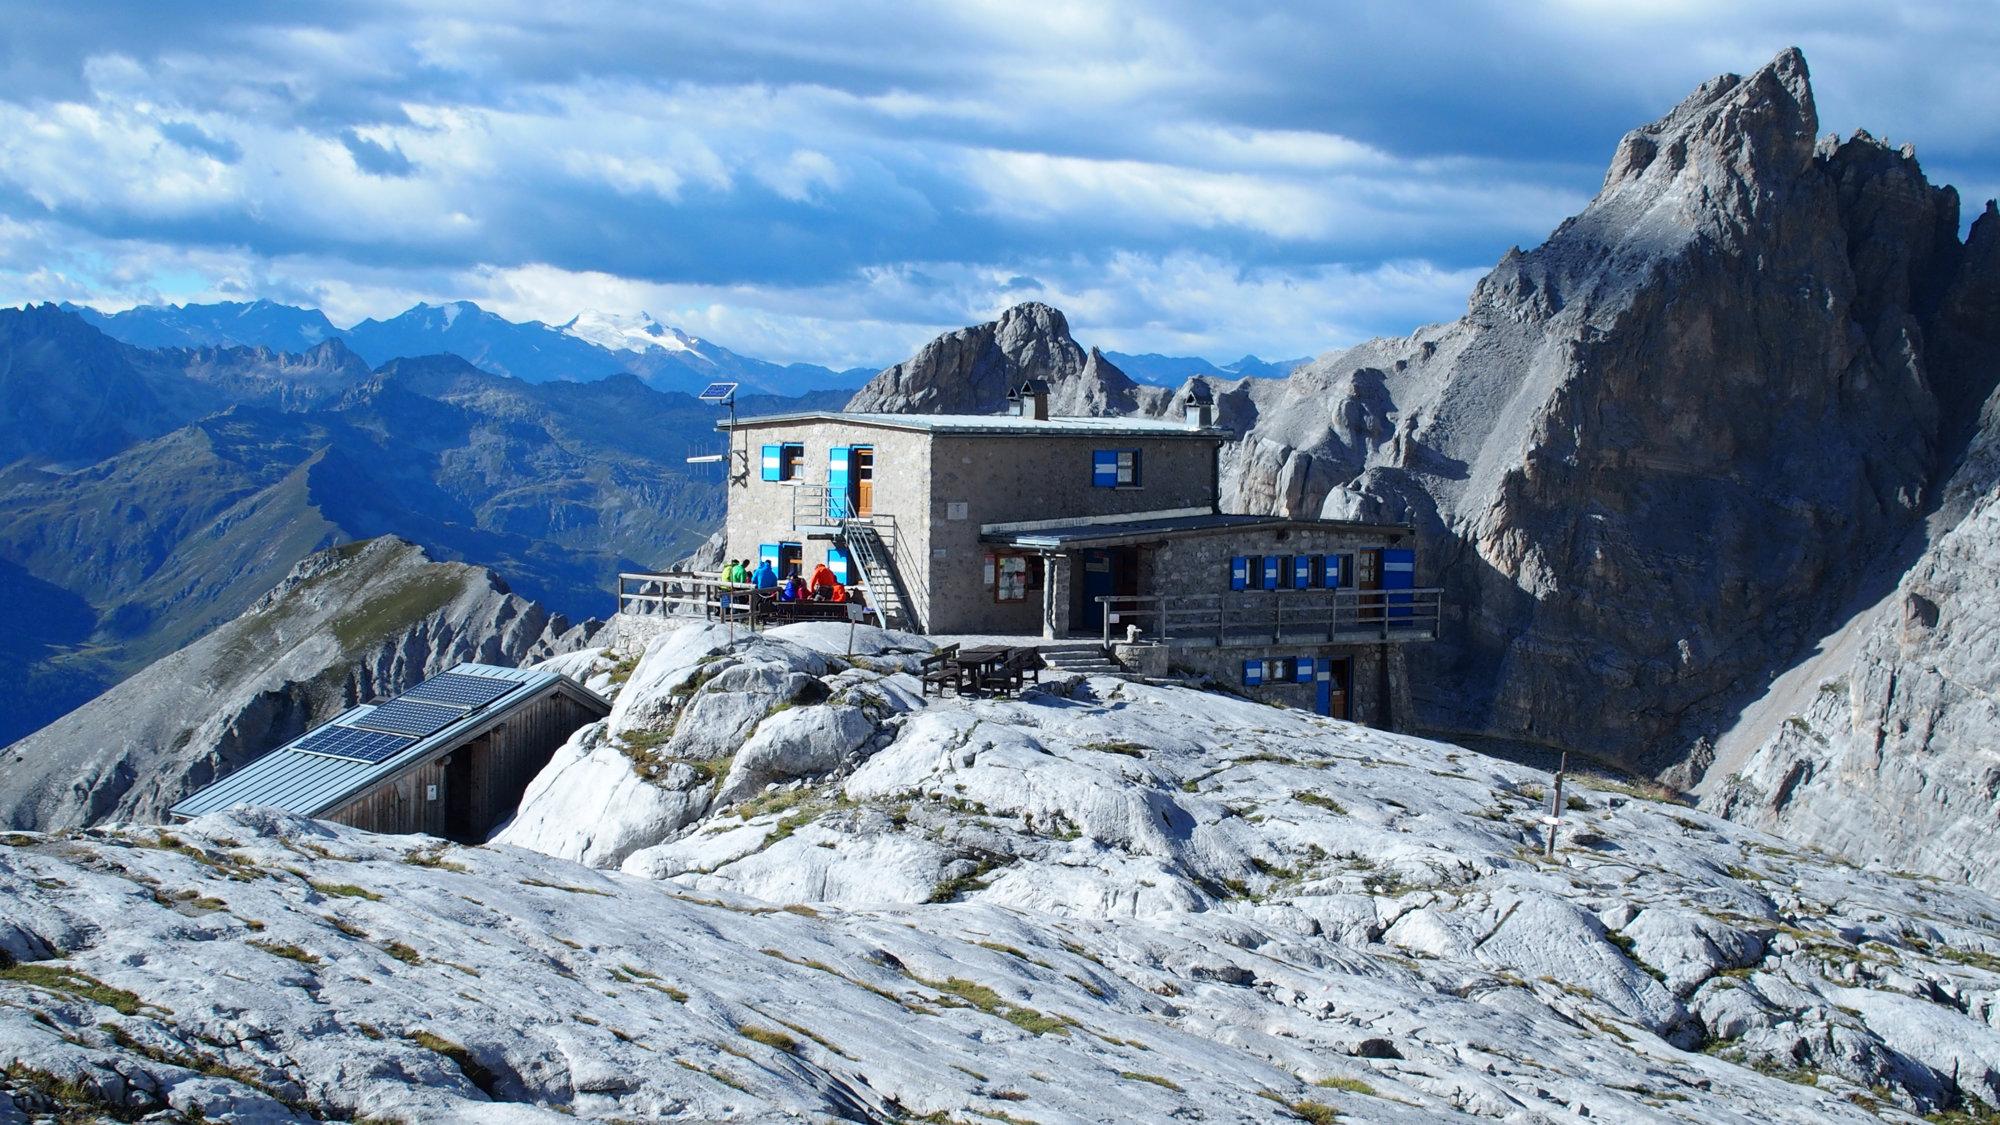 Dodici Apostoli Hütte, Brenta, Klettersteig, Dolomiten